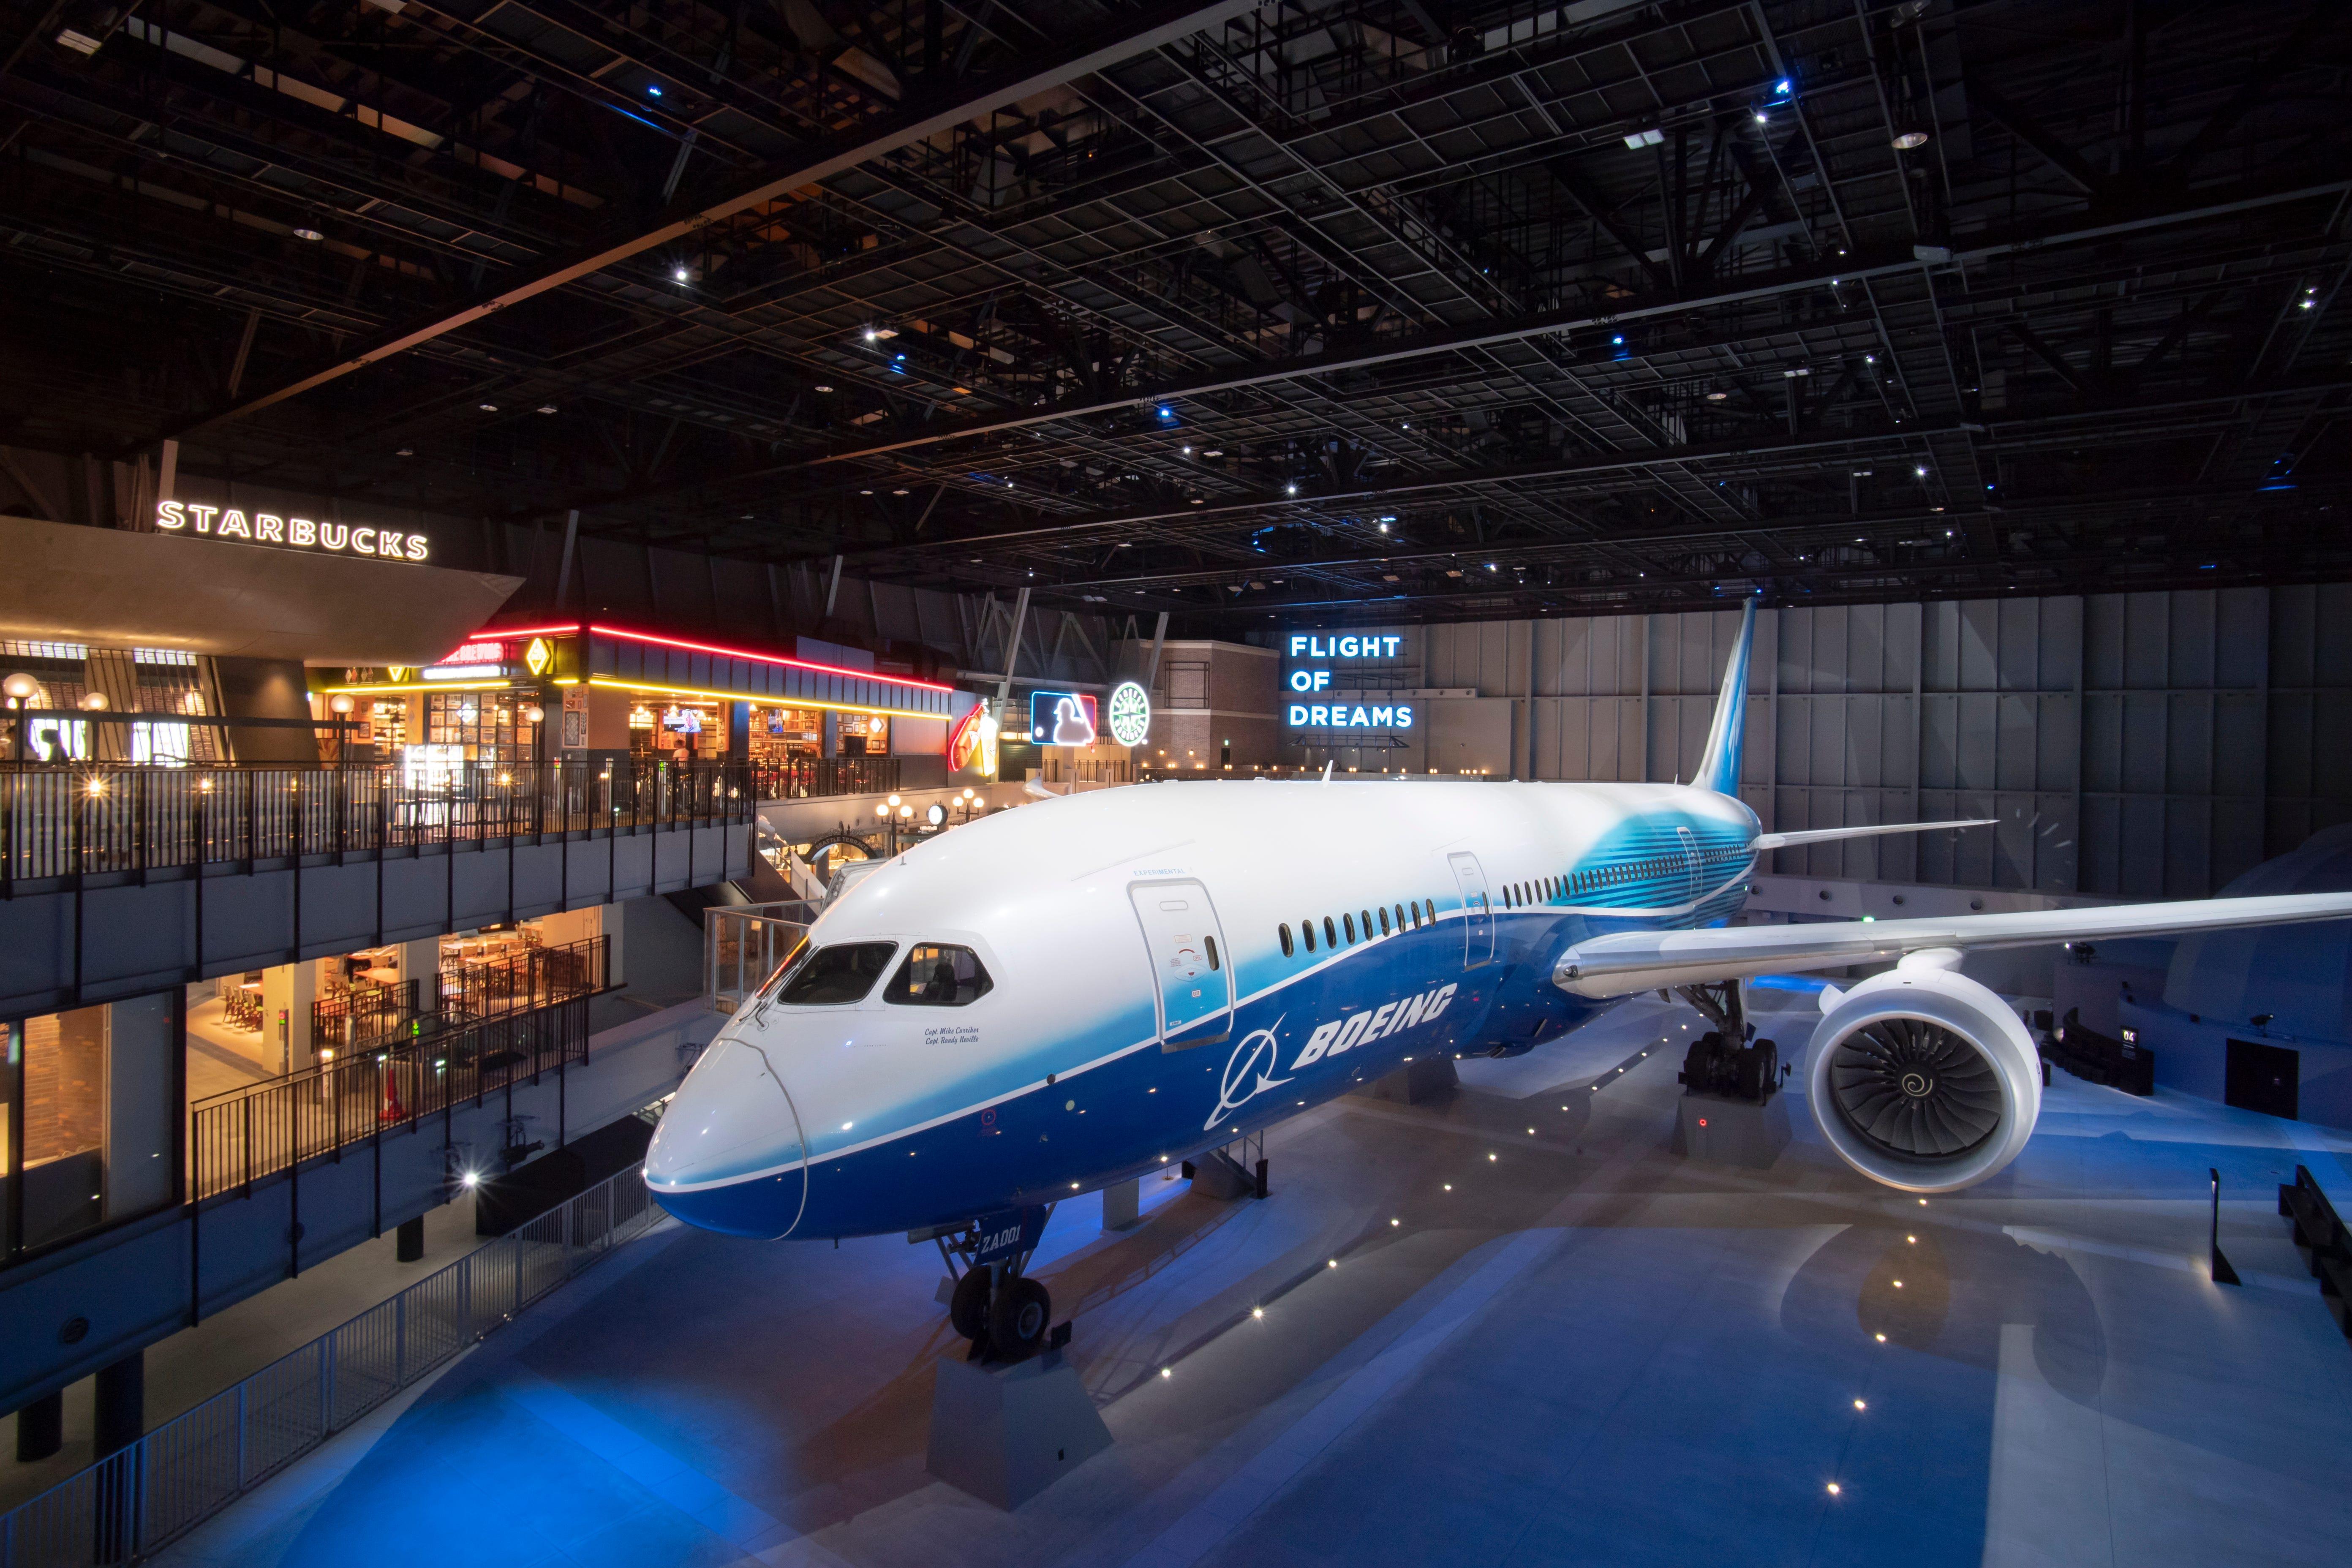 Boeing 787-8 Dreamliner stars in Flight of Dreams attraction in Japan